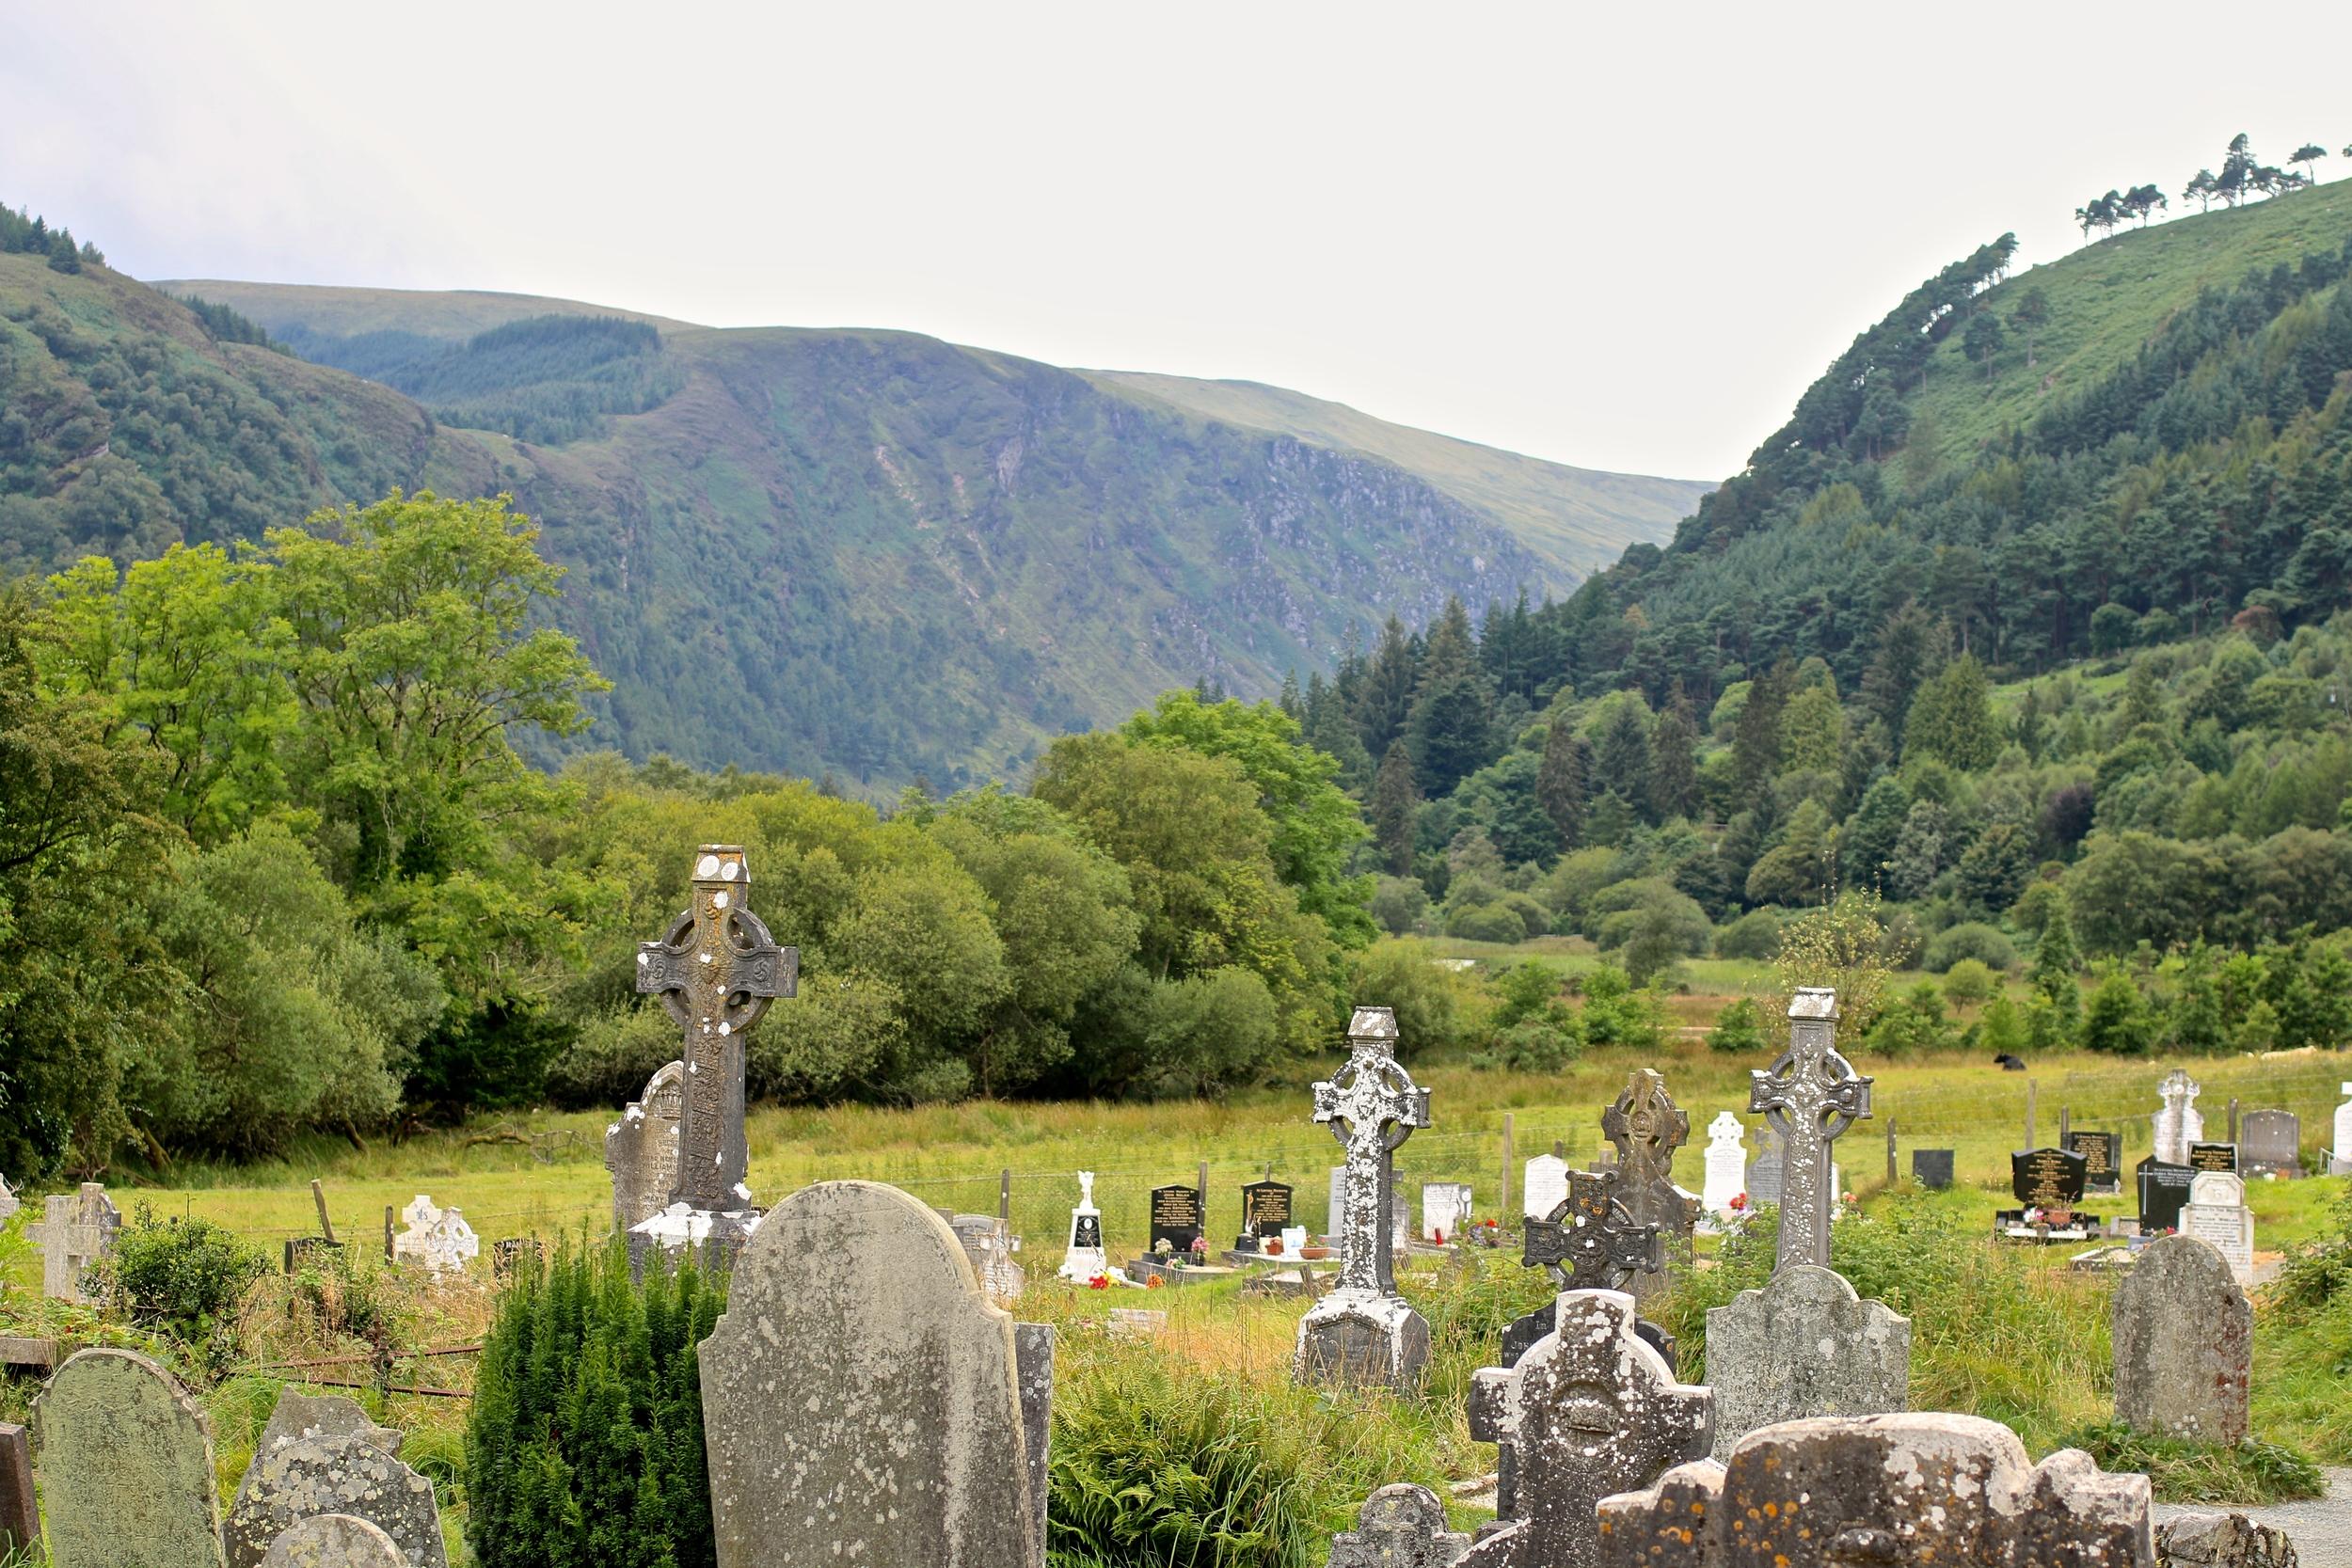 The Monastery in Glendalough.